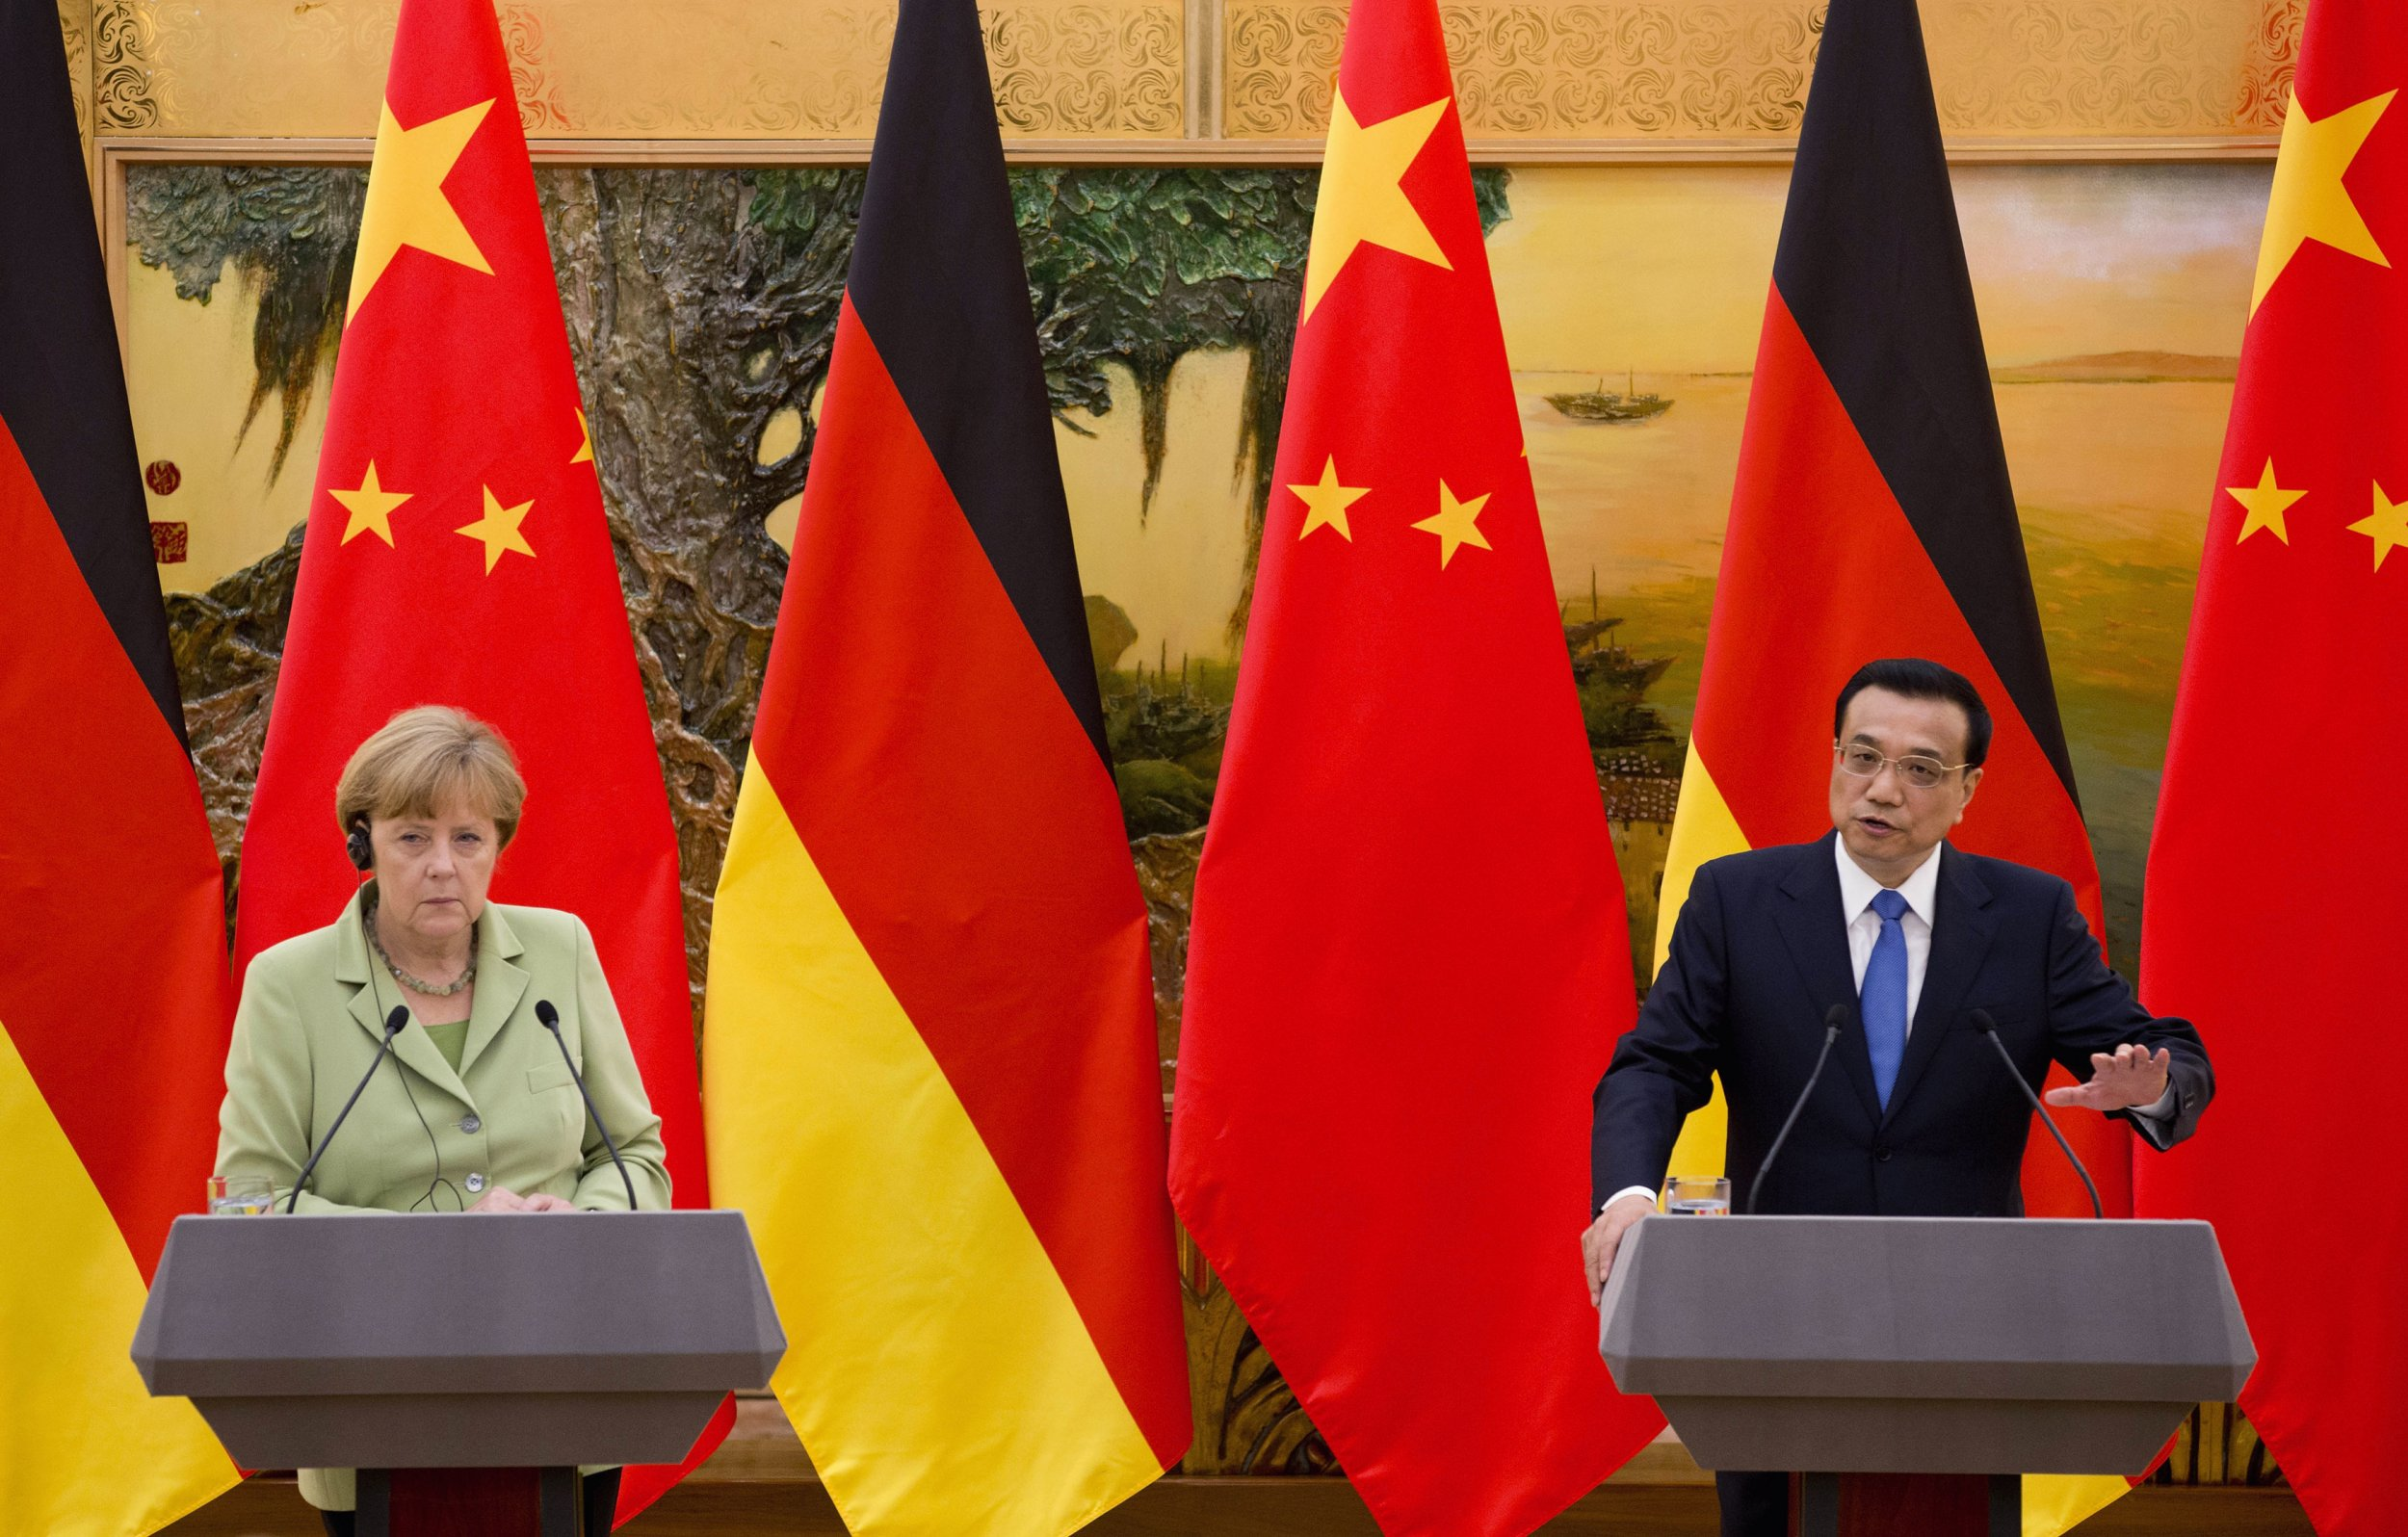 Merkel and Li